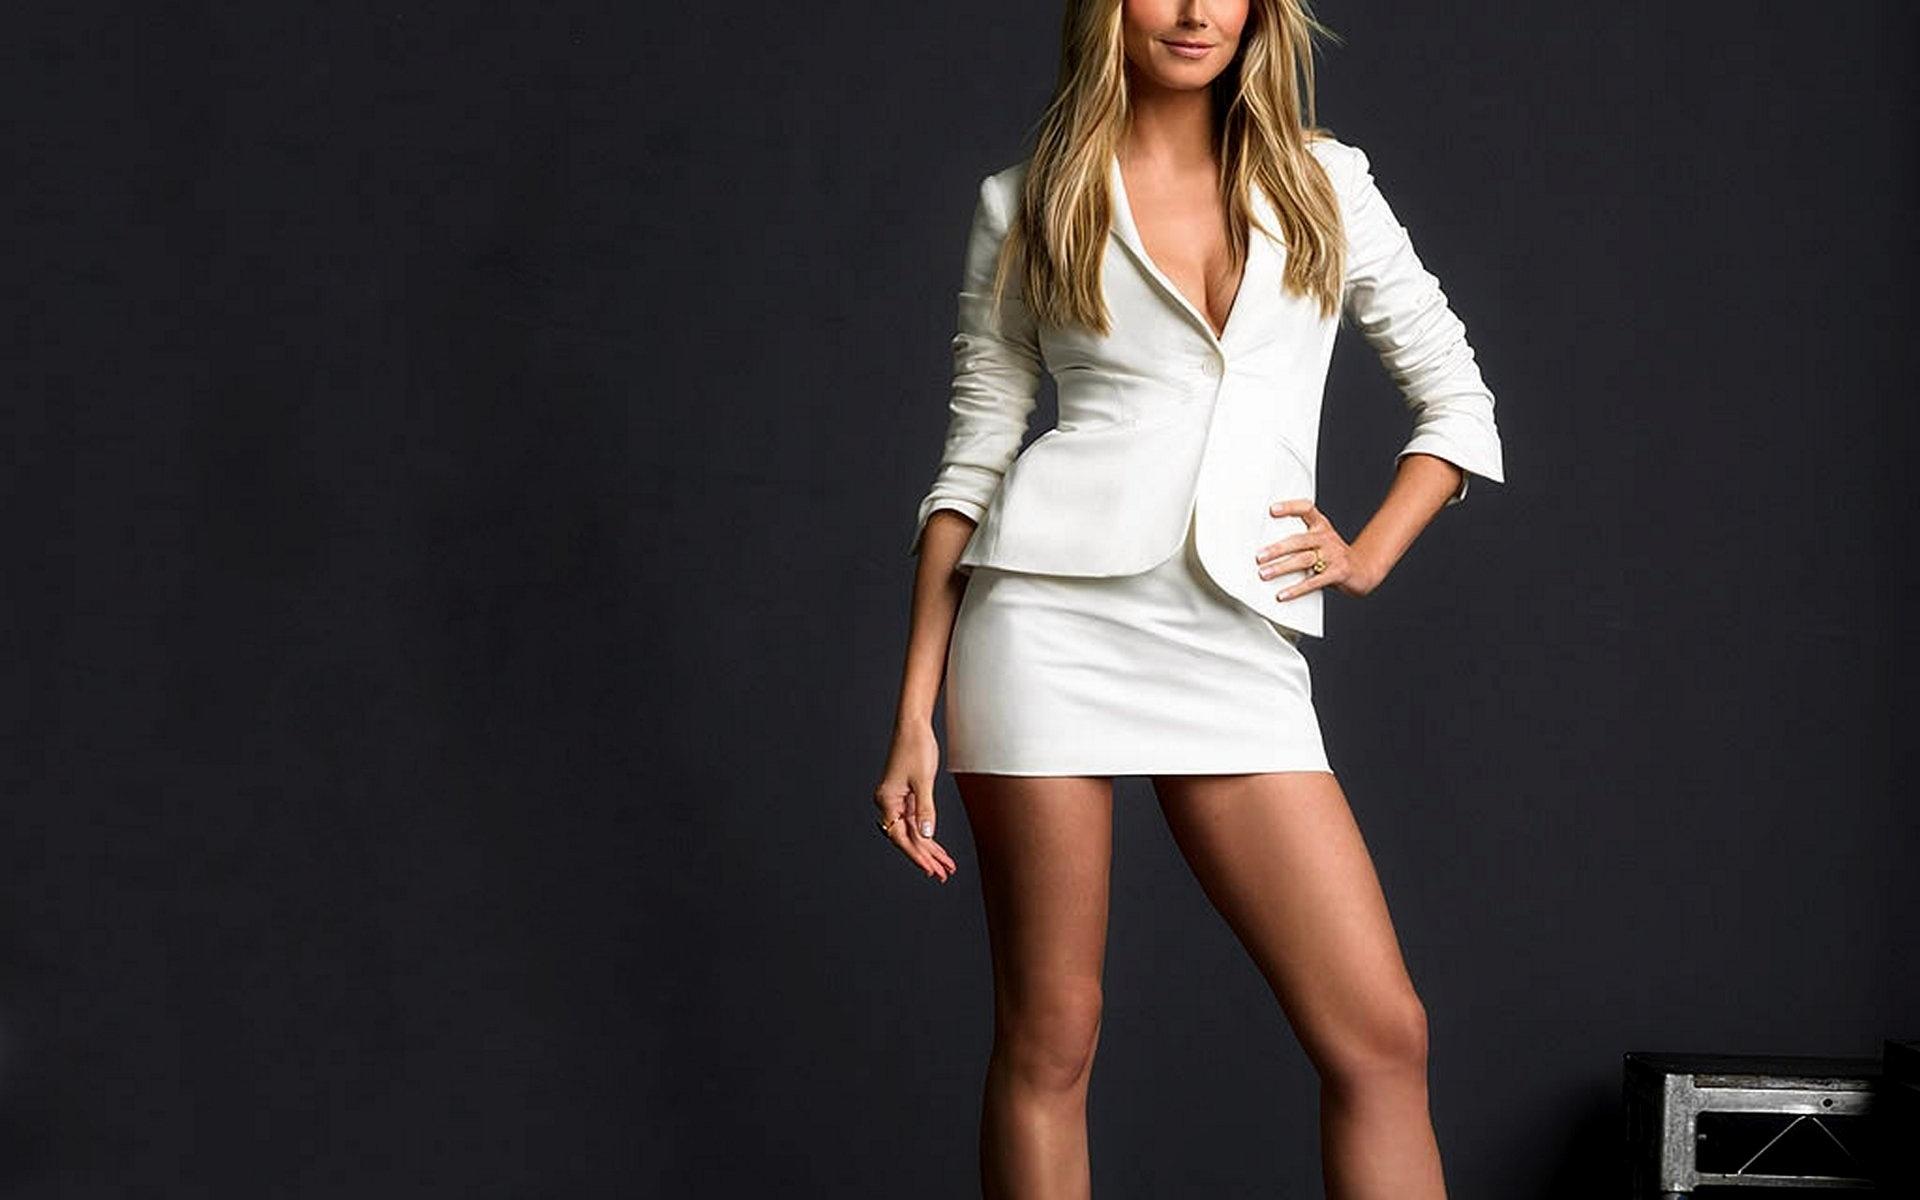 Фото девушки в мини юбке с разрезом 1 фотография